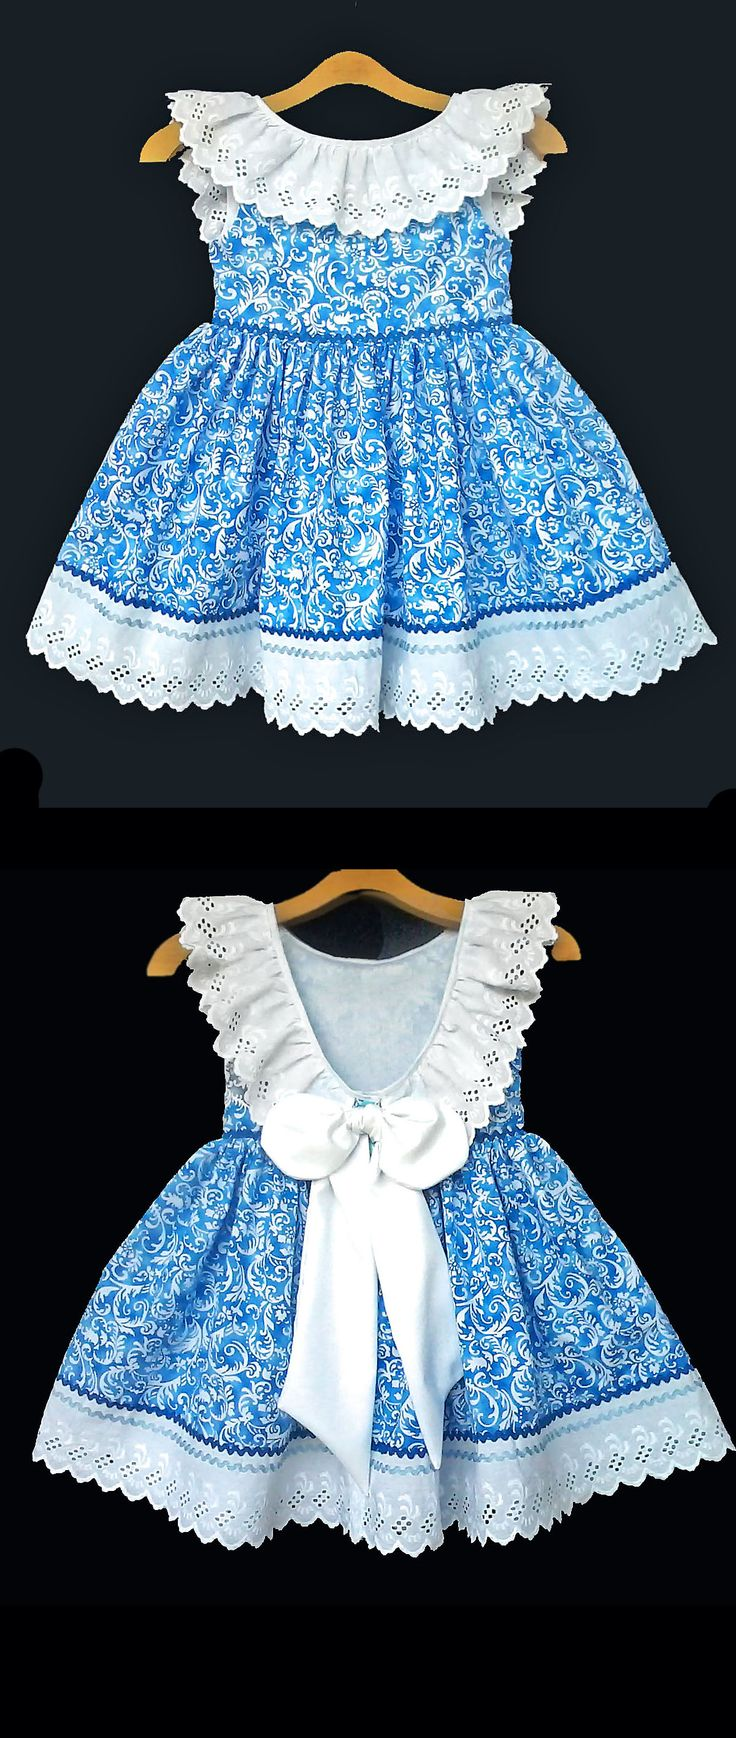 Beaiuful dress little one 🎁